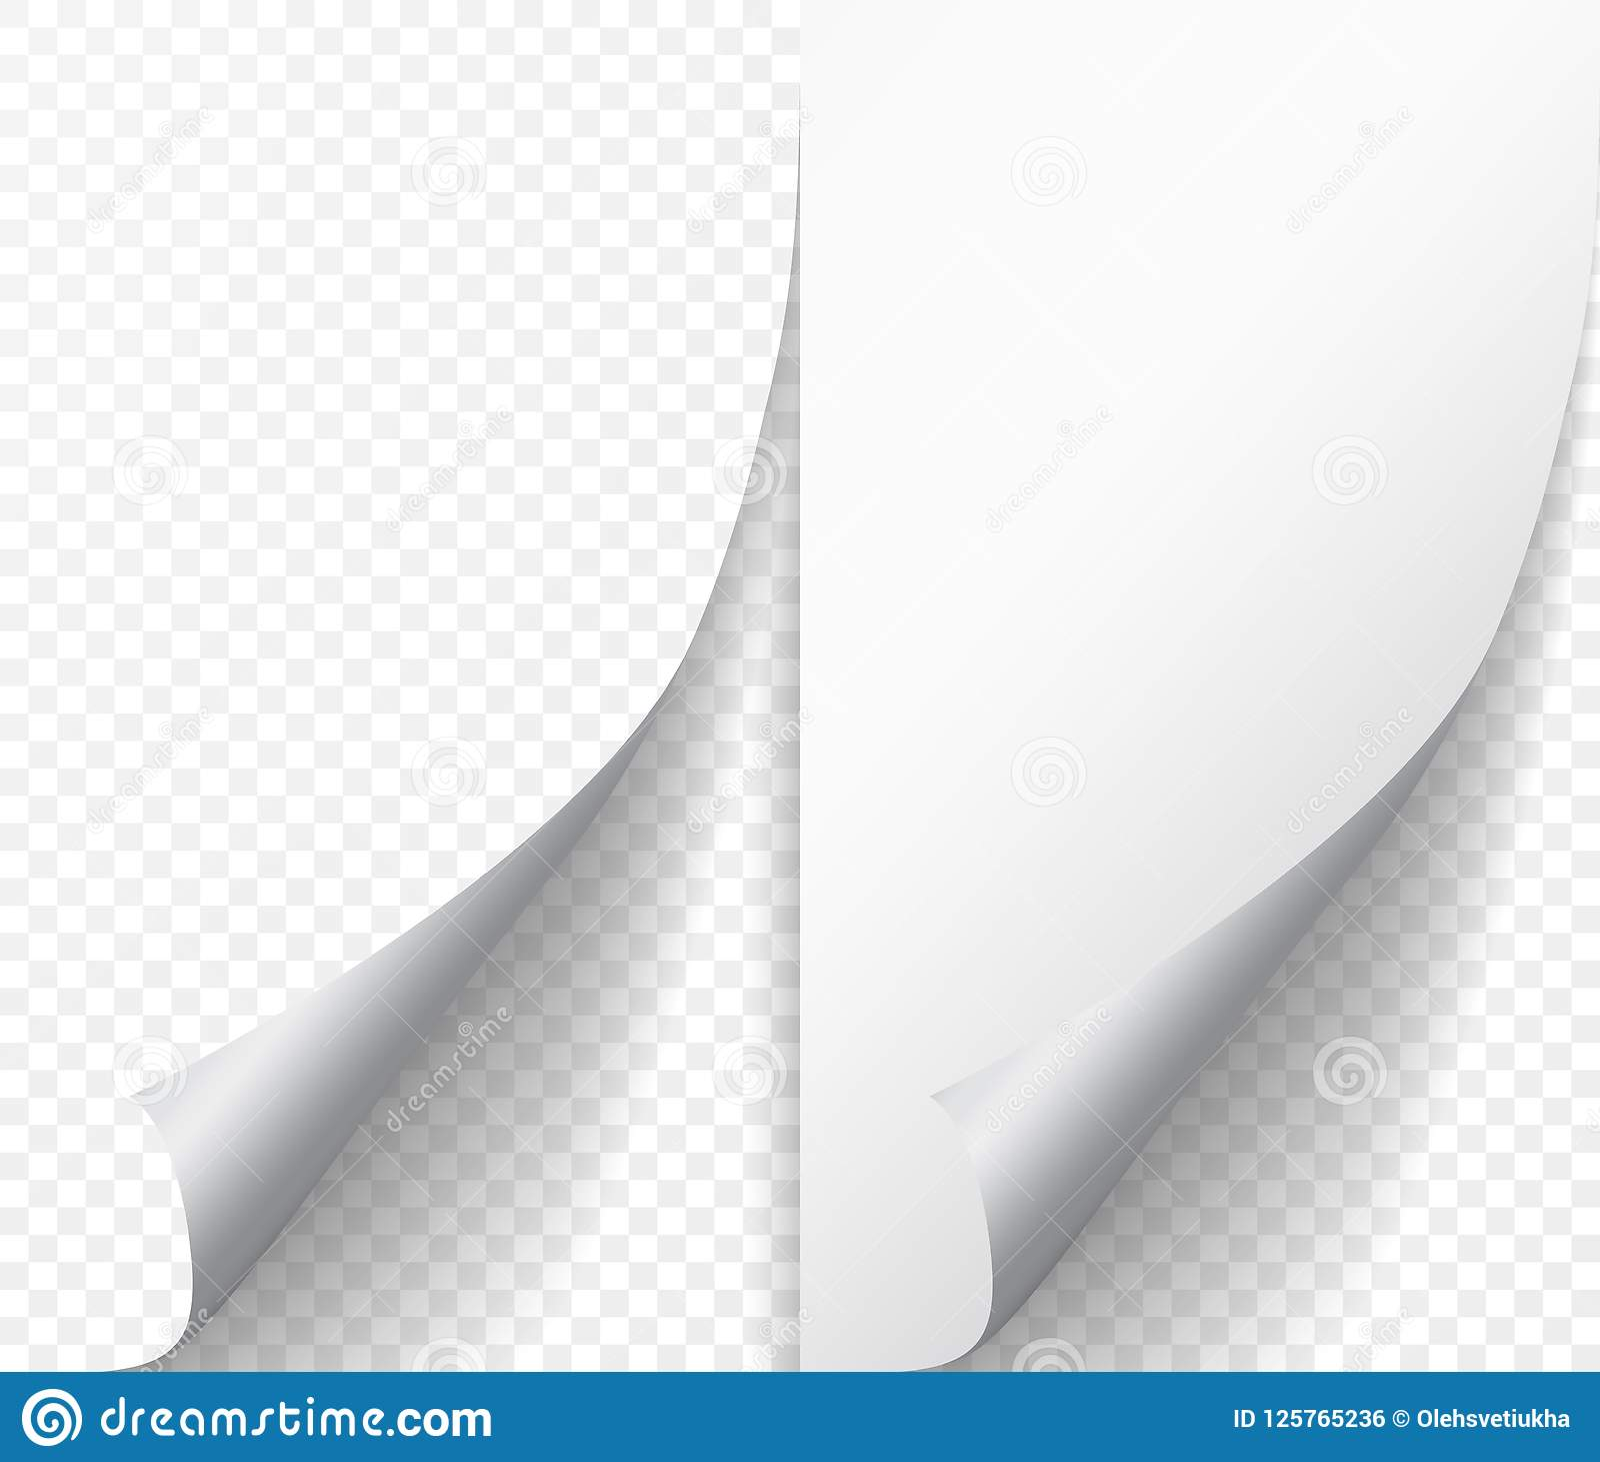 Flip Cartoons, Illustrations  Vector Stock Images - 23951 -6805